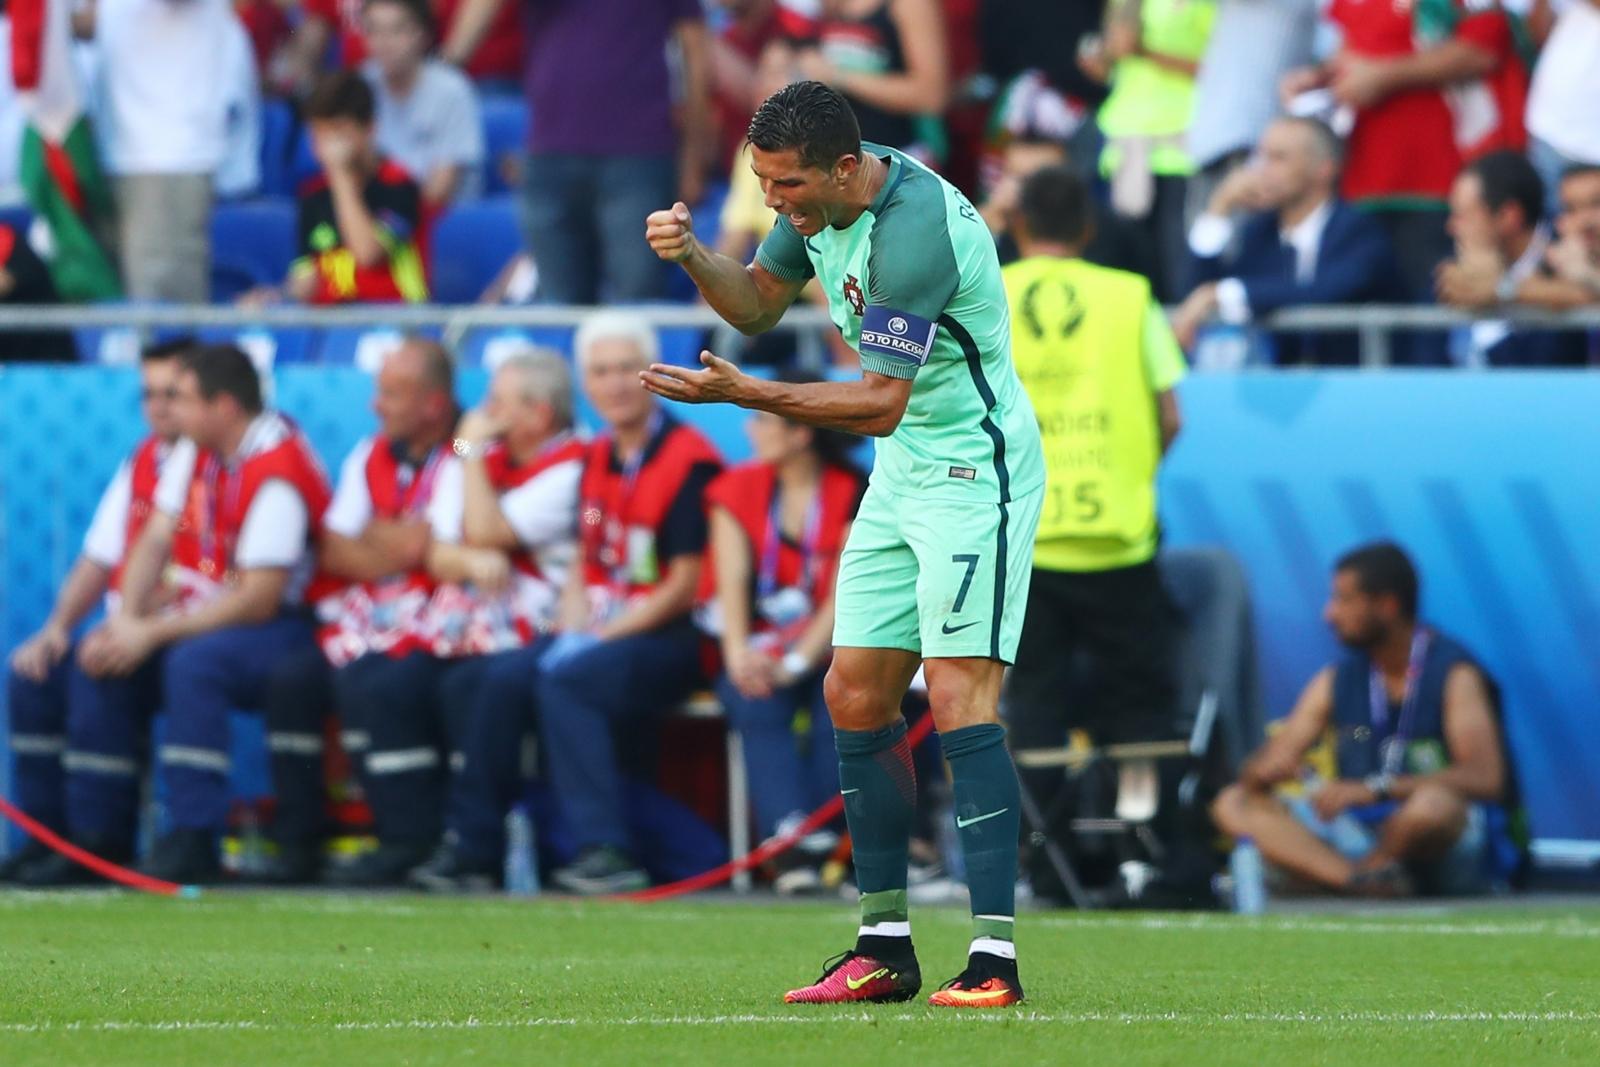 Ronaldo urges his teammates on